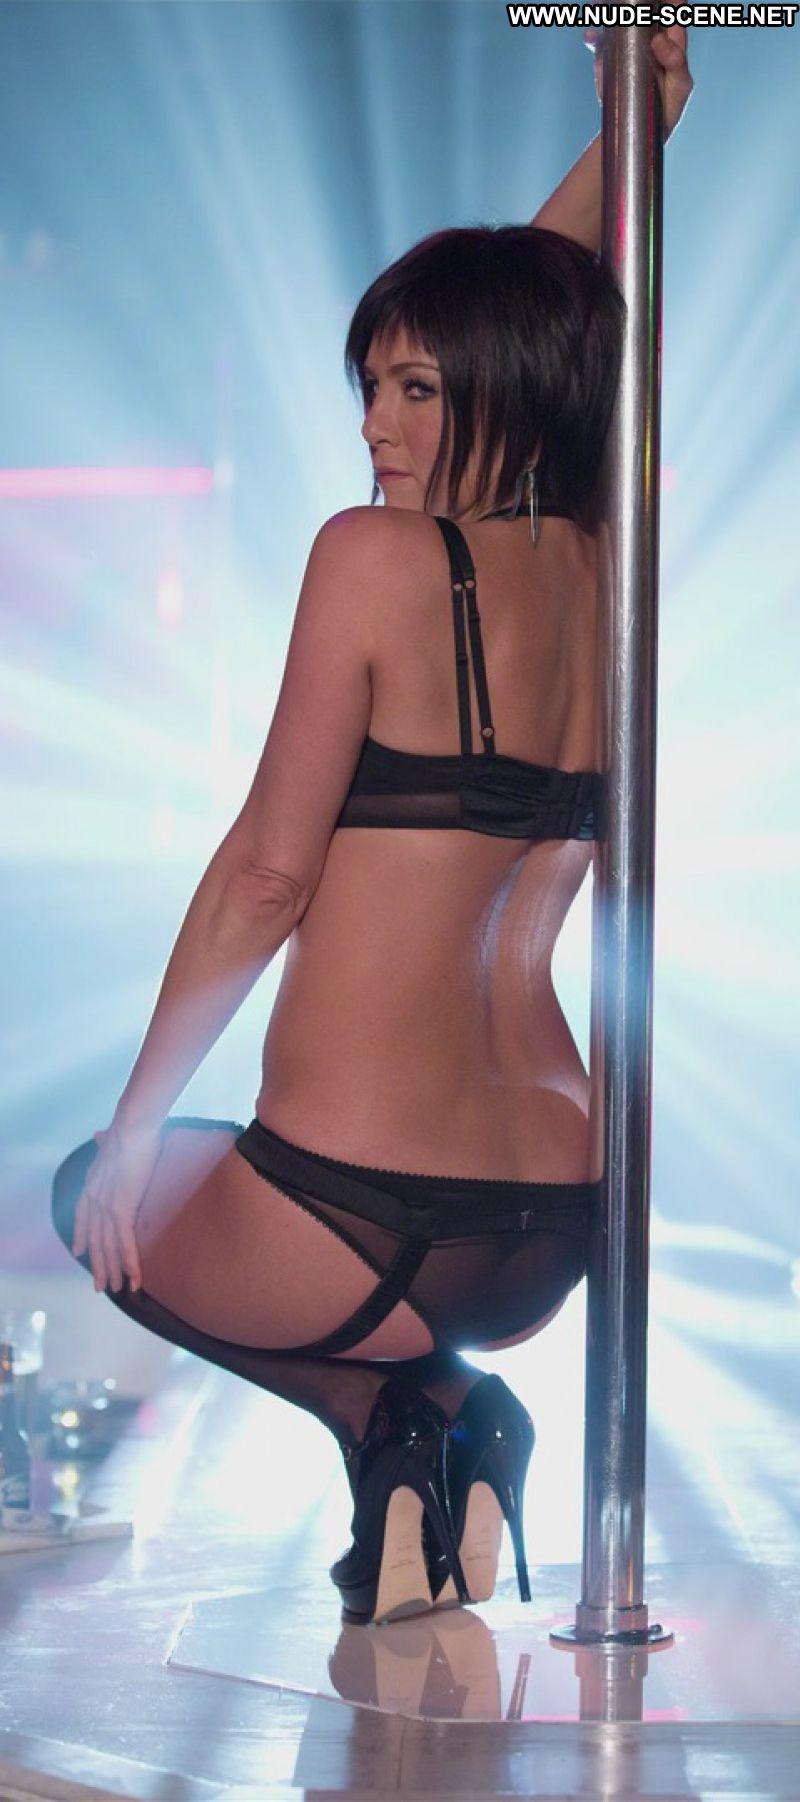 Jennifer Aniston No Source Celebrity Posing Hot Stockings -7559